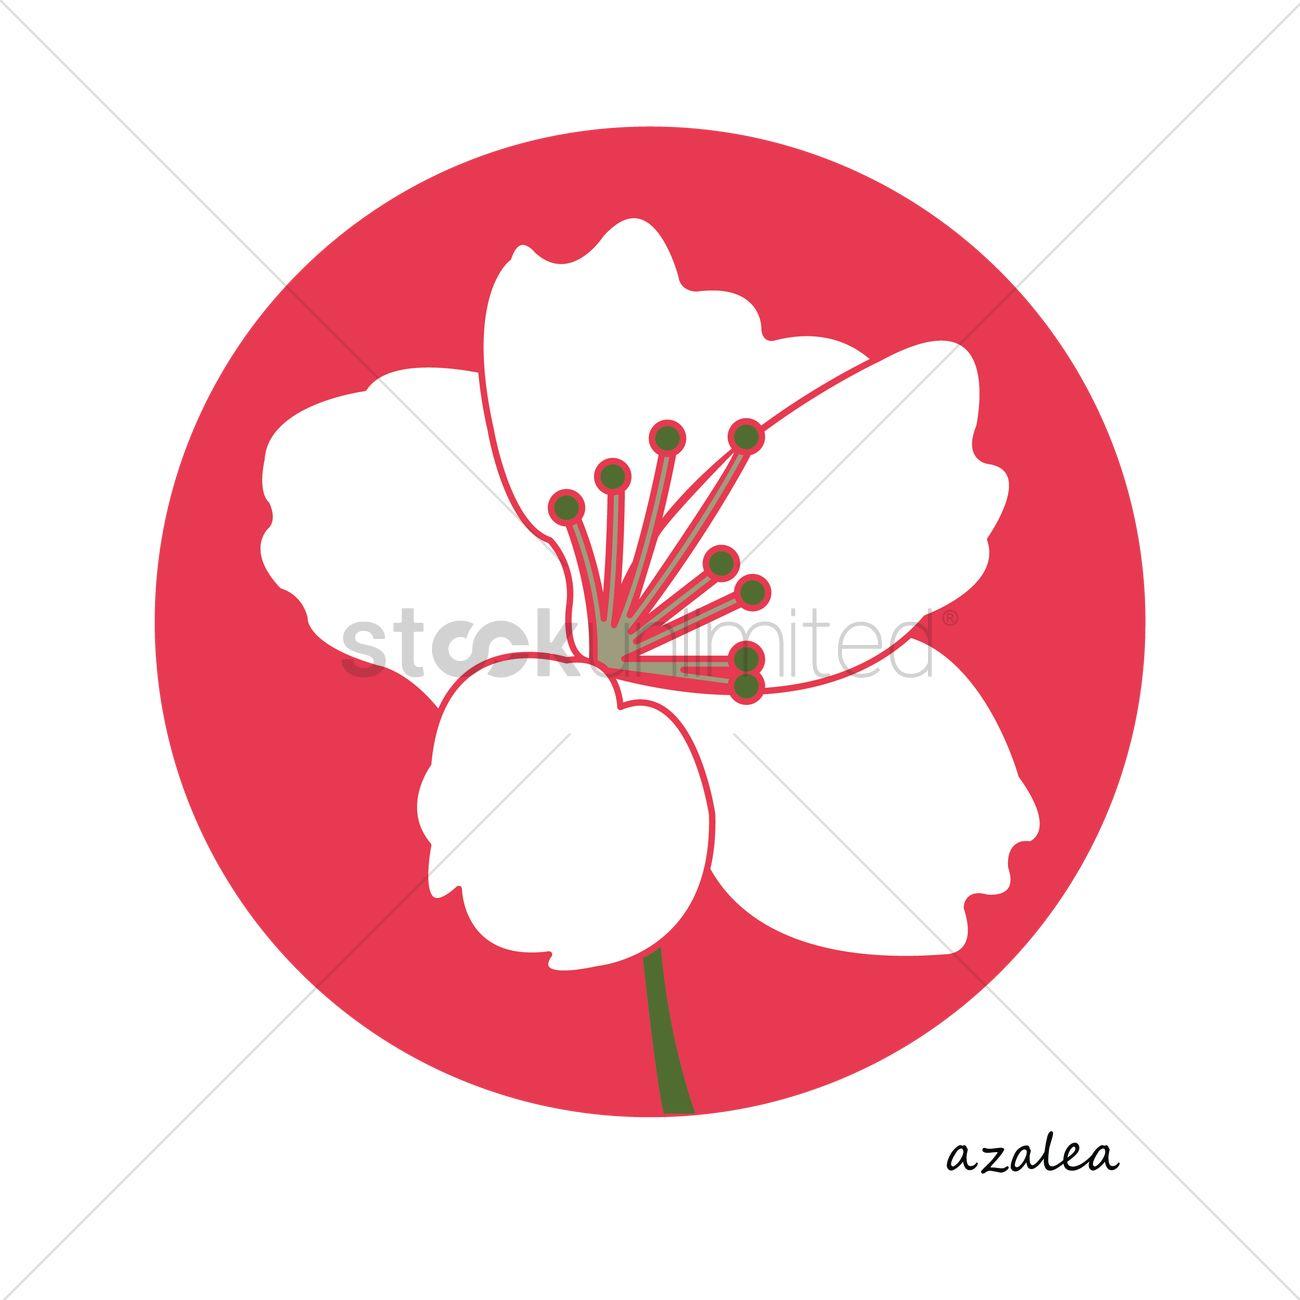 Free Azalea flower Vector Image.